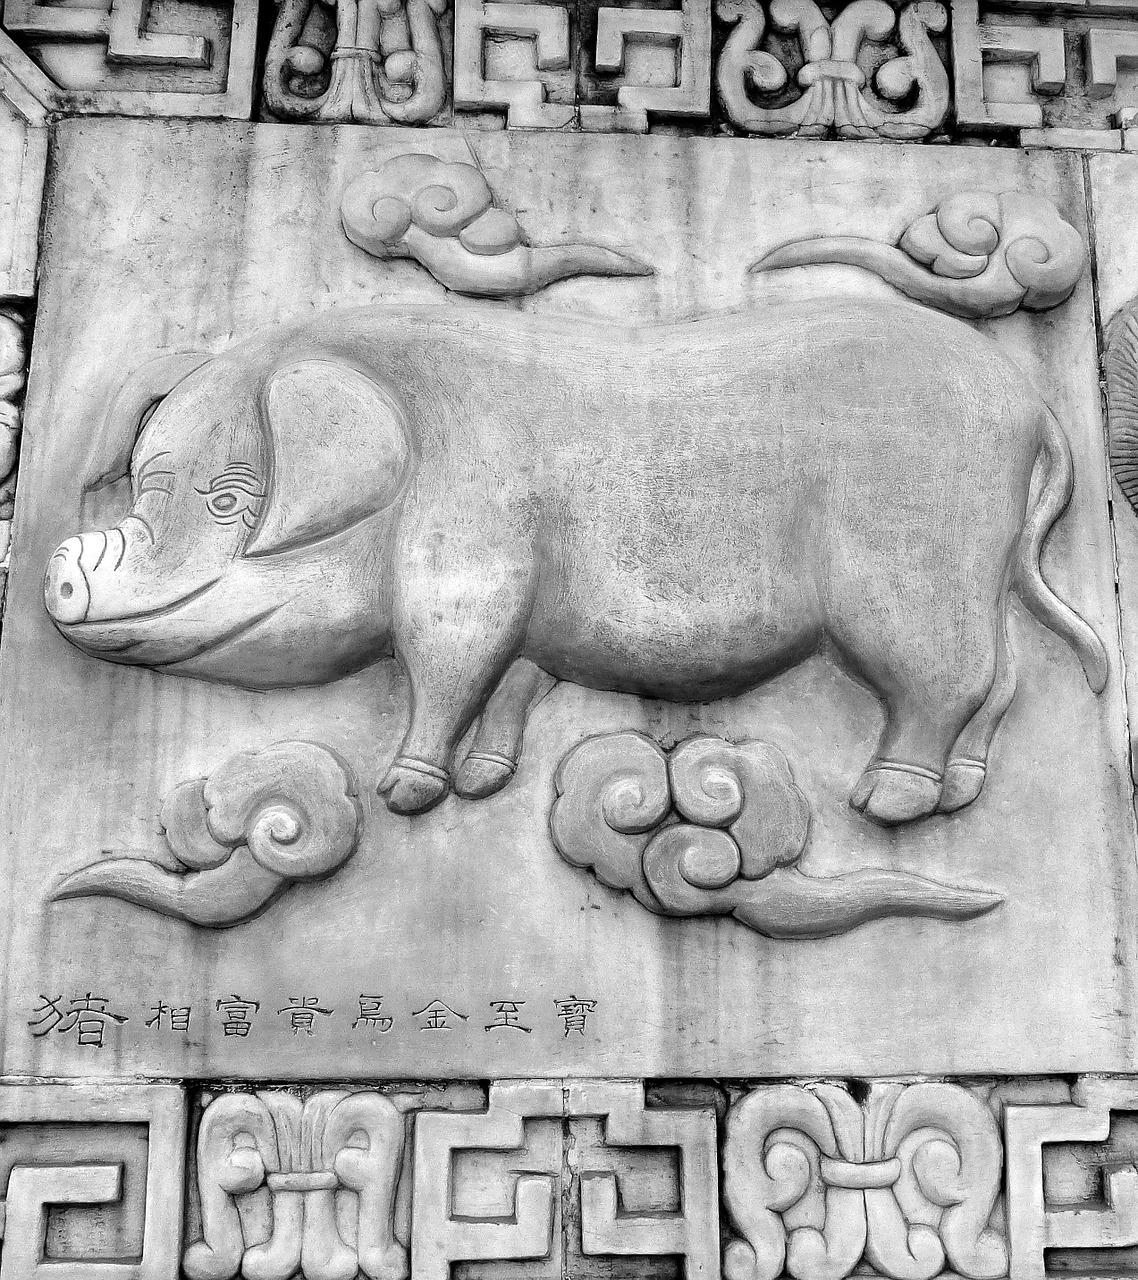 Porco - Horóscopo Chinês